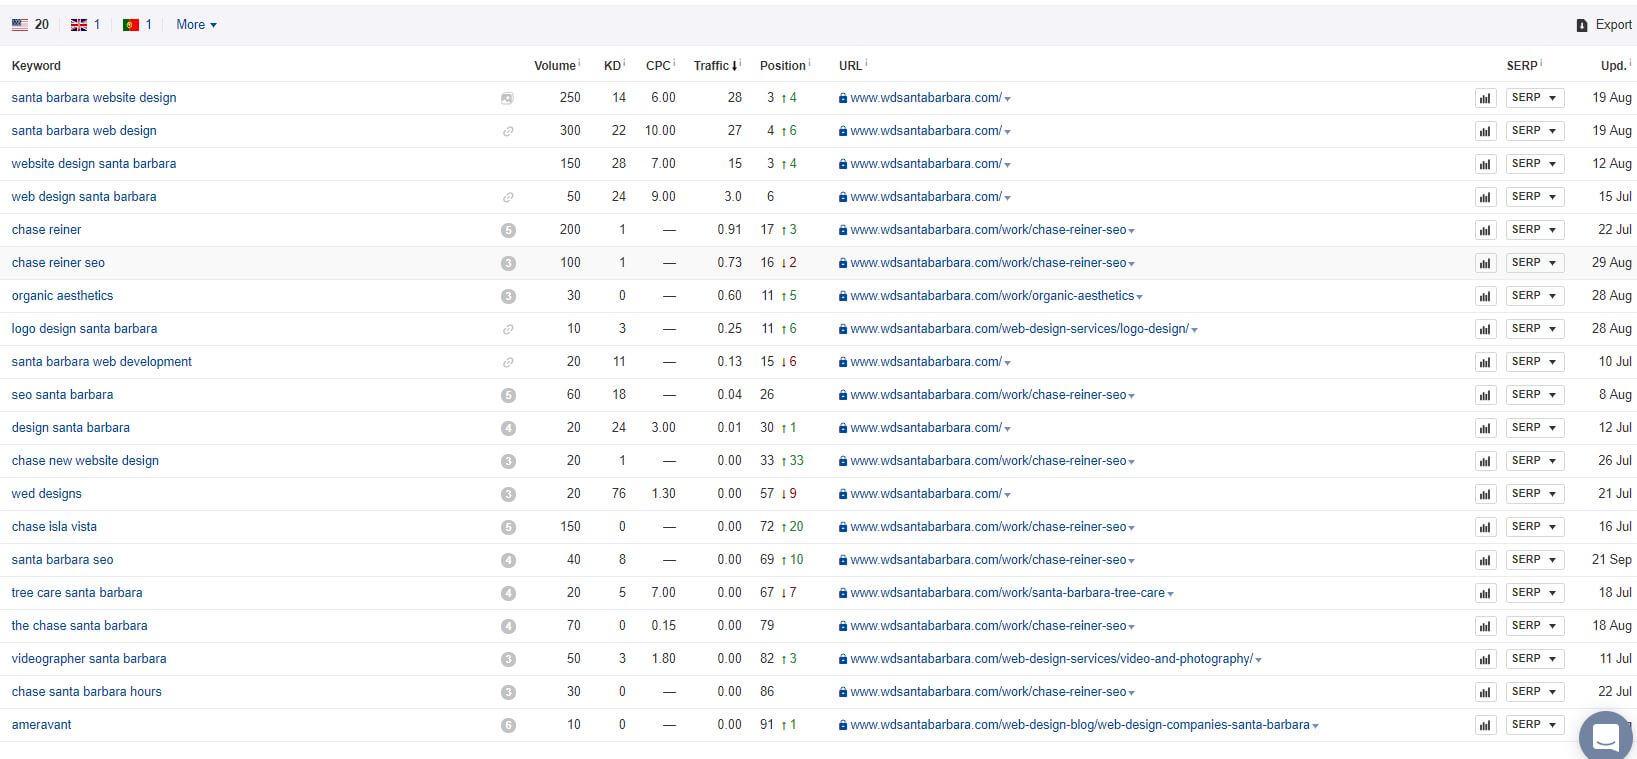 web design santa barbara keywords.JPG